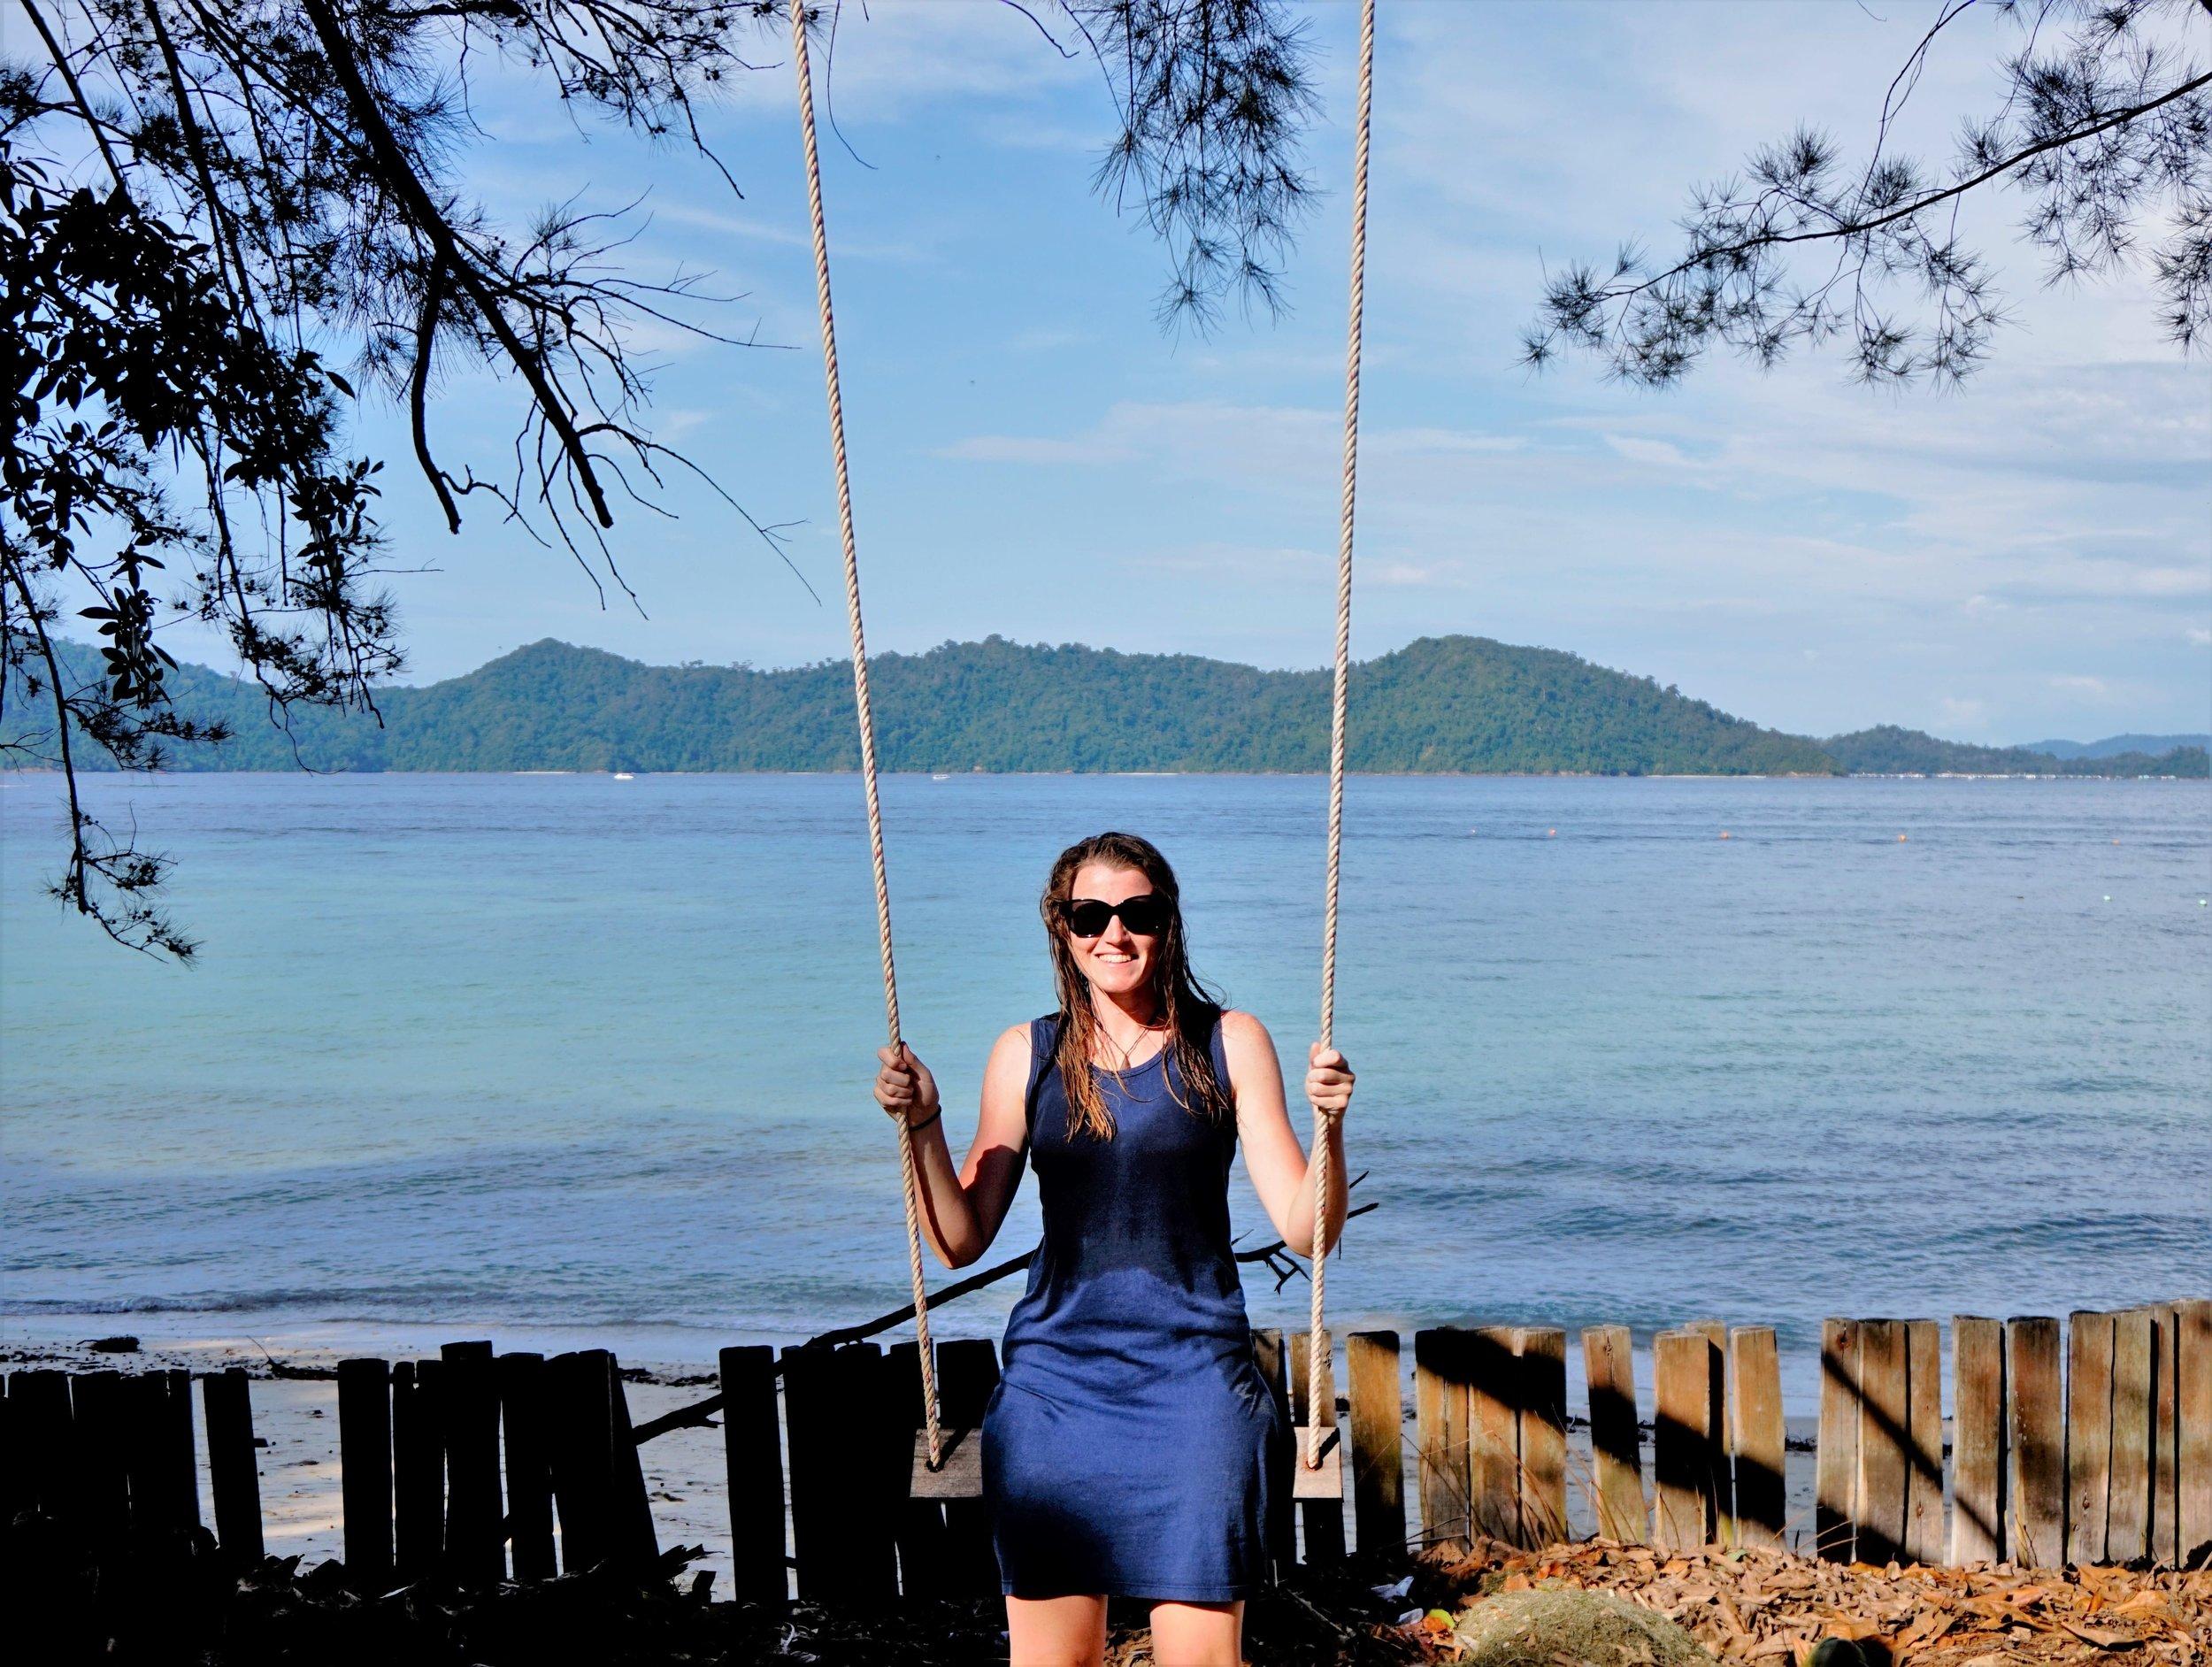 Visiting the Tunku Abdul Rahman National Park from Kota Kinabalu